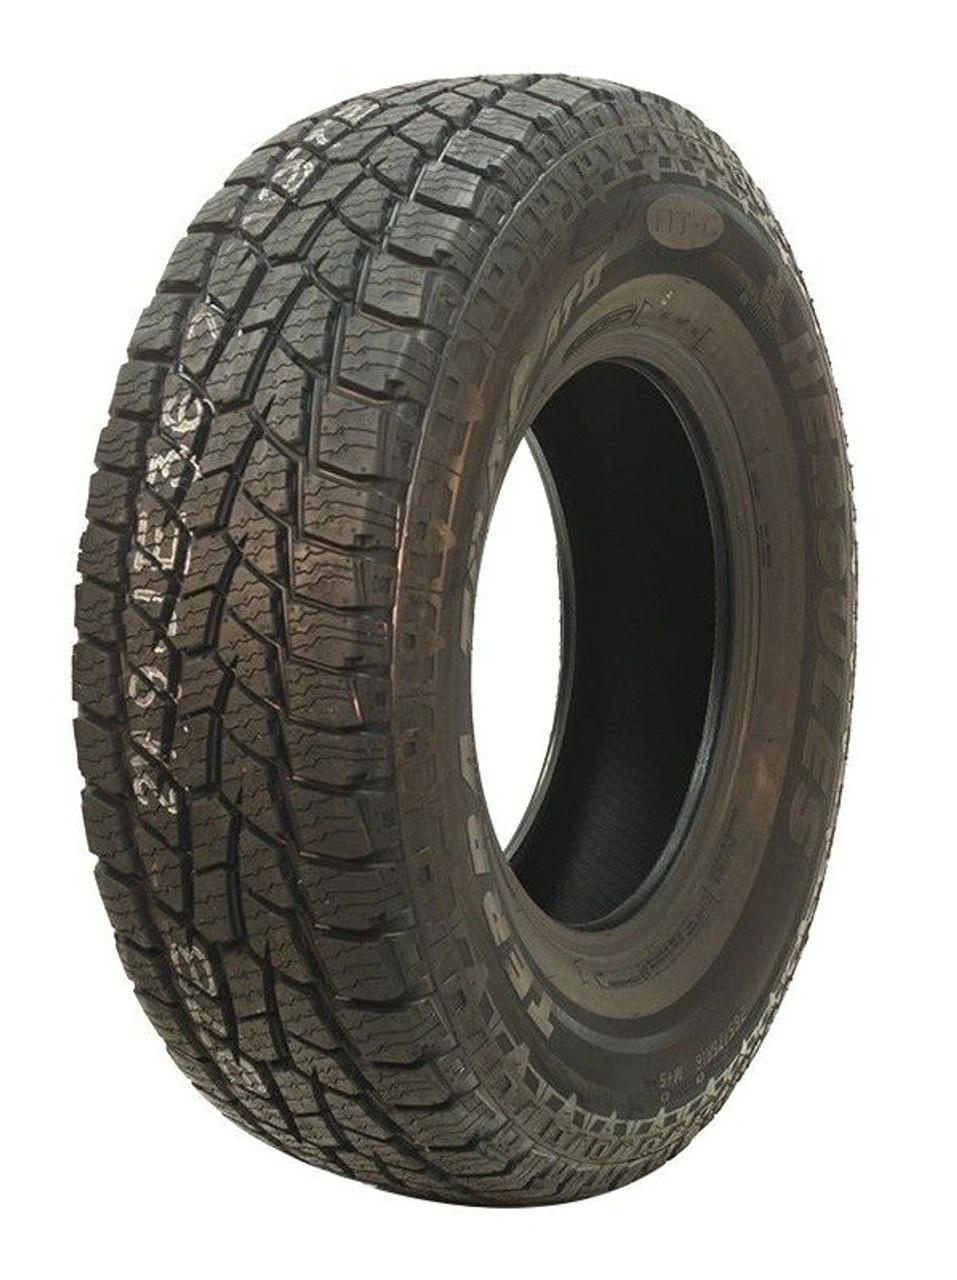 New Tire 265 70 17 Hercules Terra Trac AT II OWL 10 ply LT265/70R17 60,000 Miles